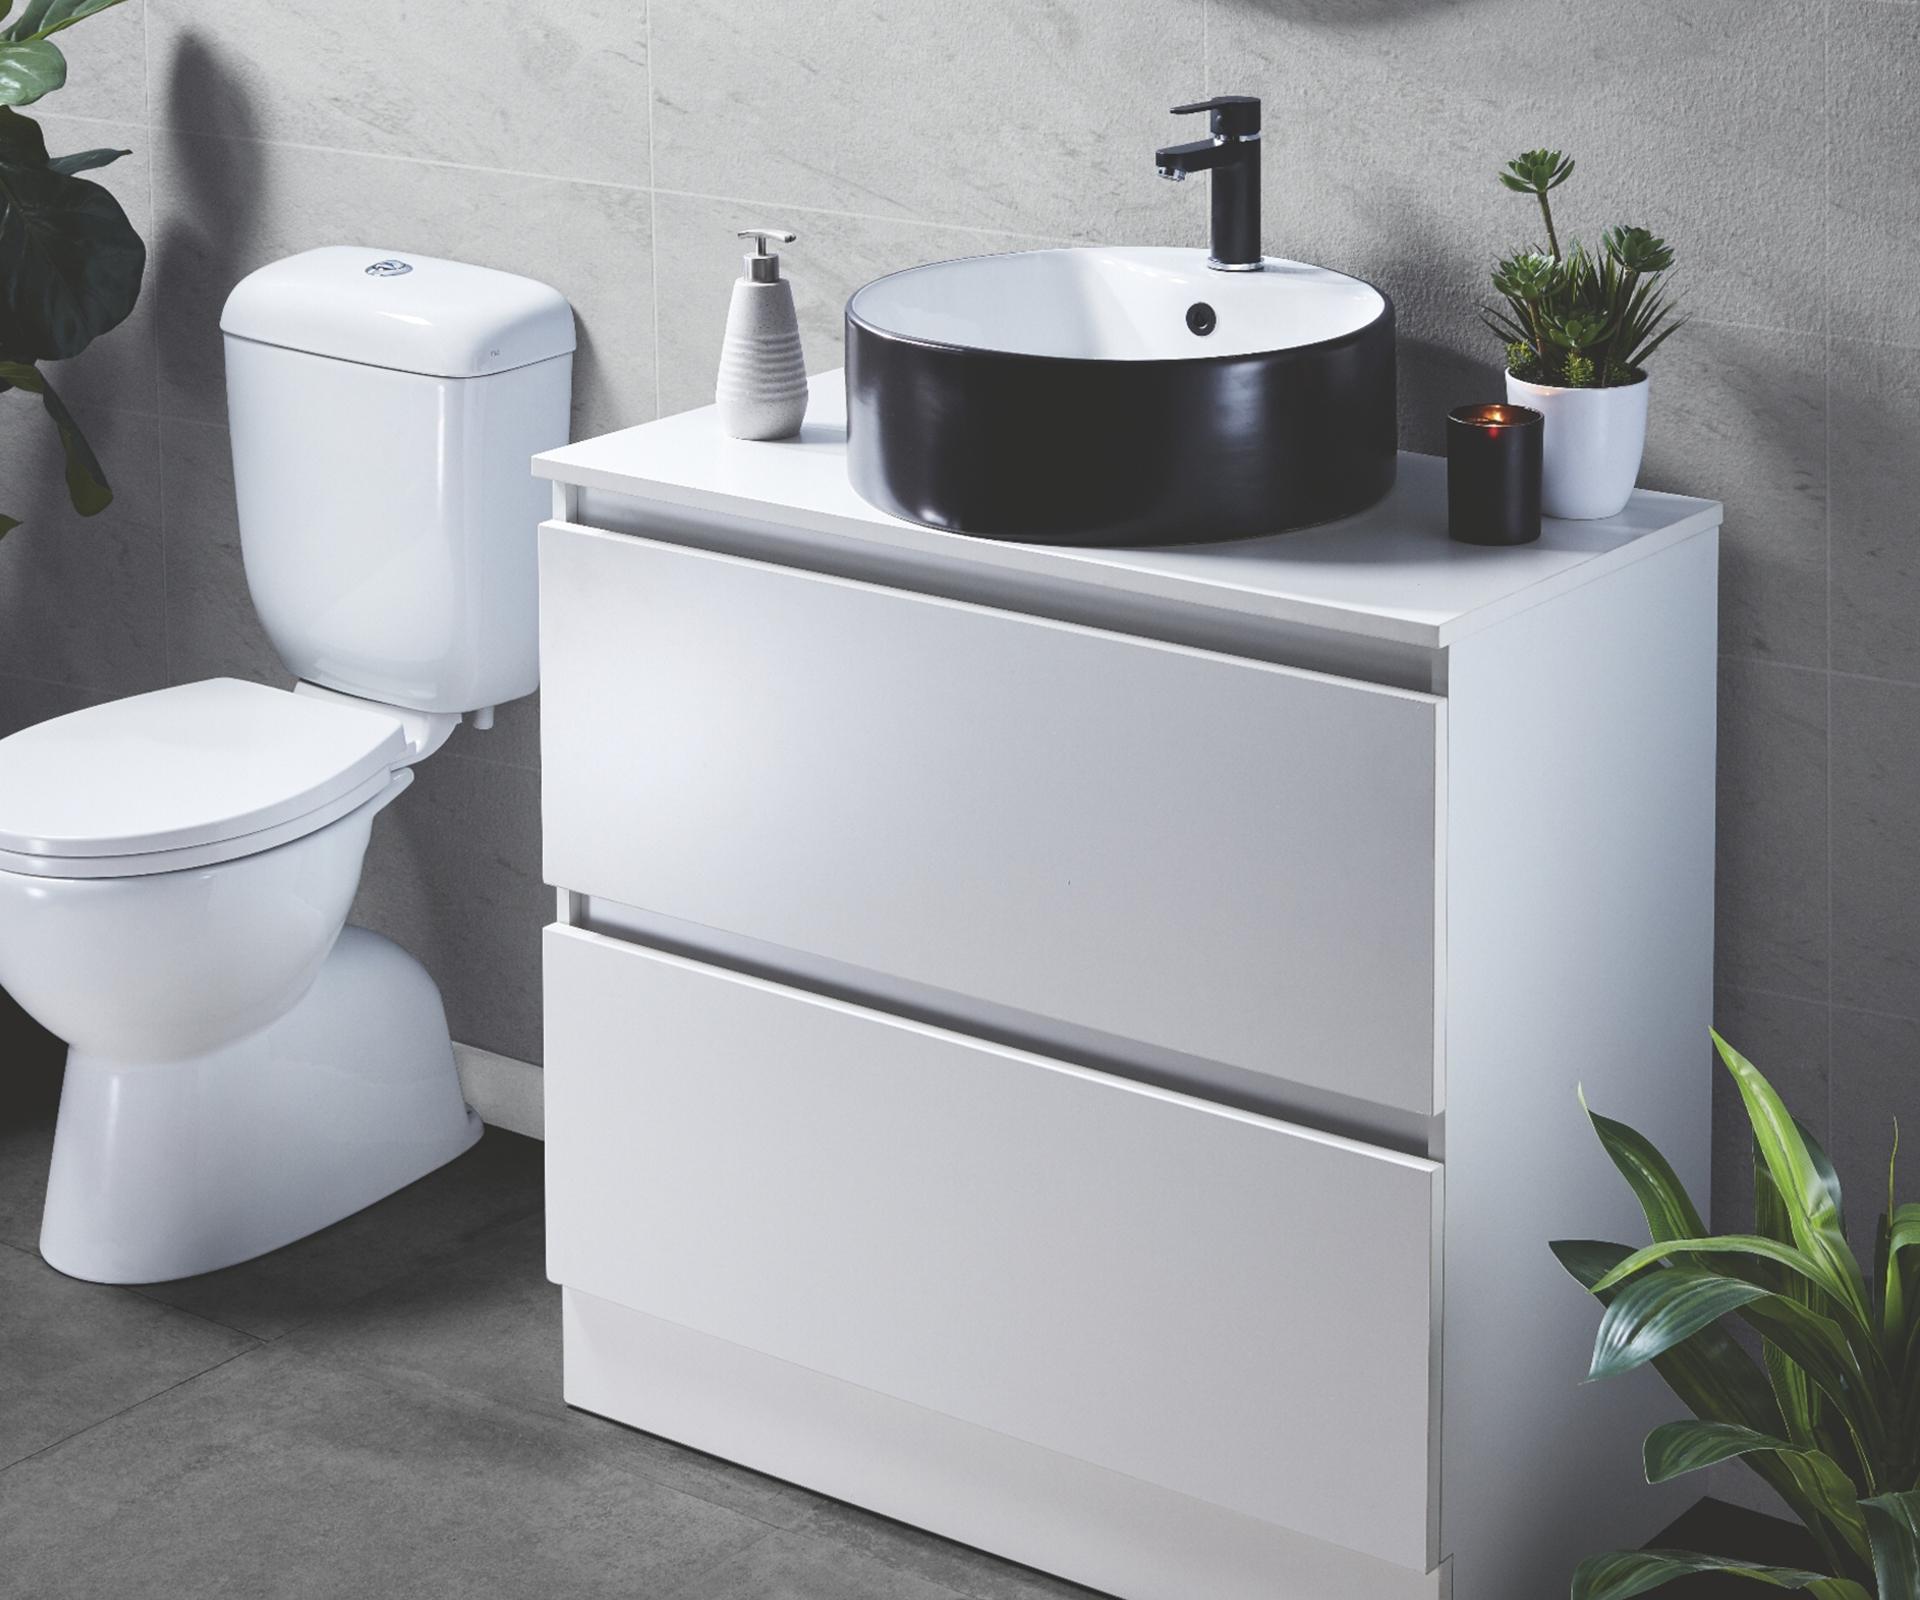 Aldi's next Special Buy sale makes bathroom renovations affordable